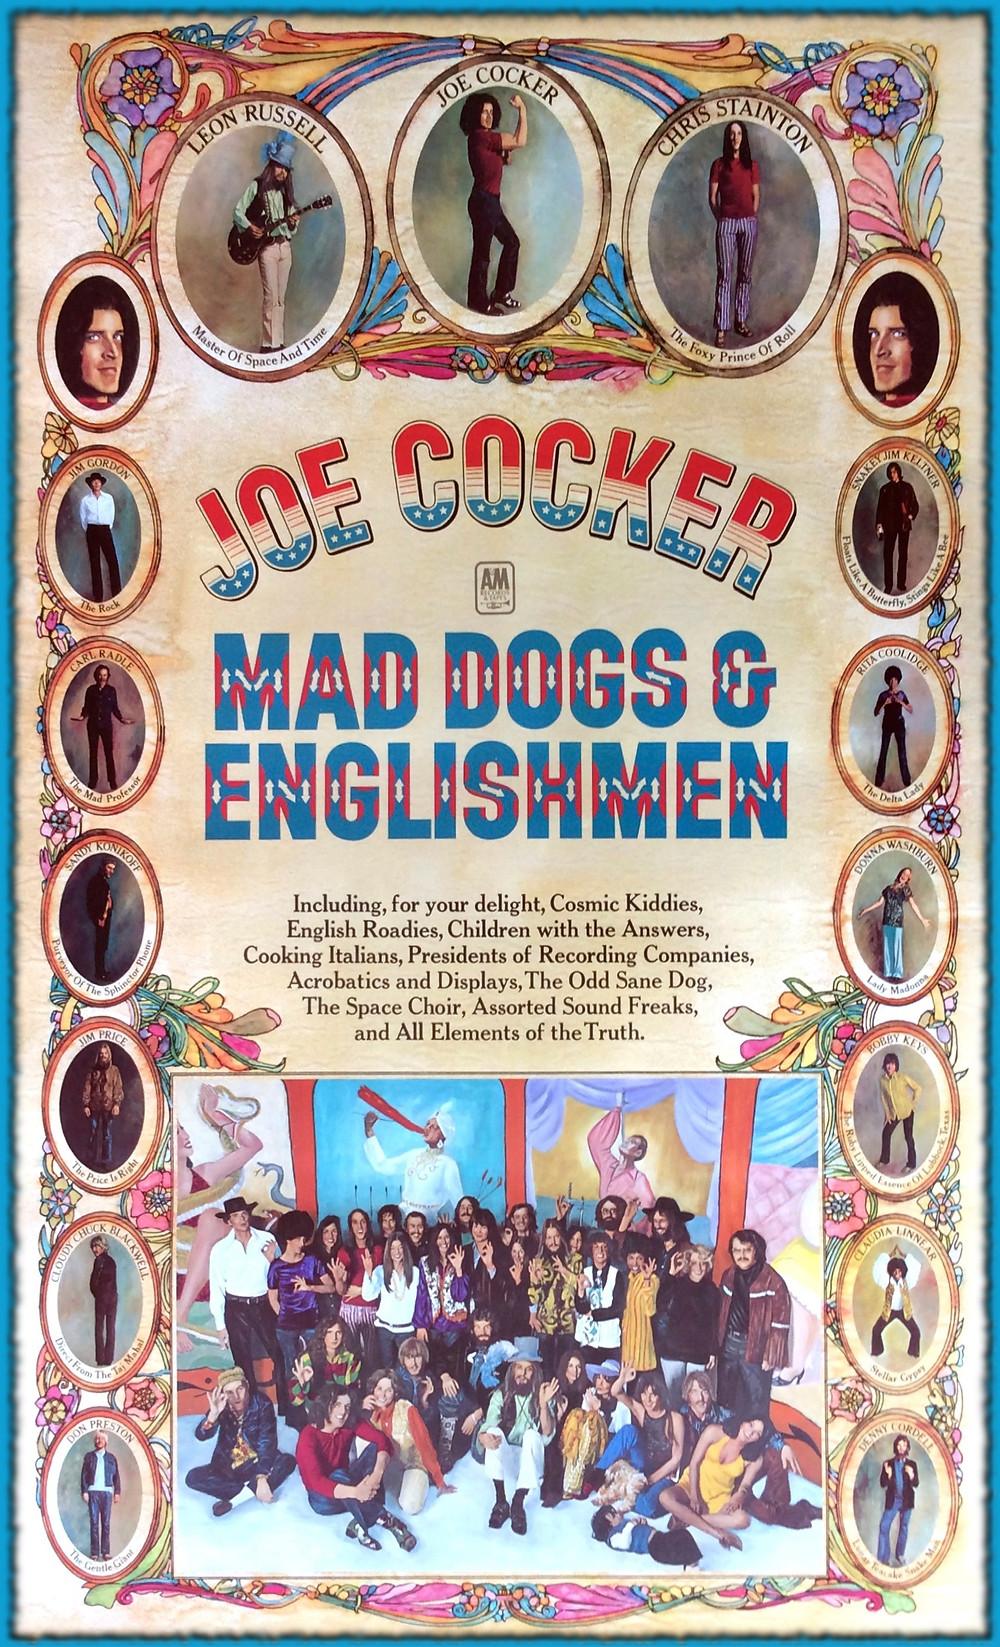 MAD DOGS & ENGLISHMEN, 1970